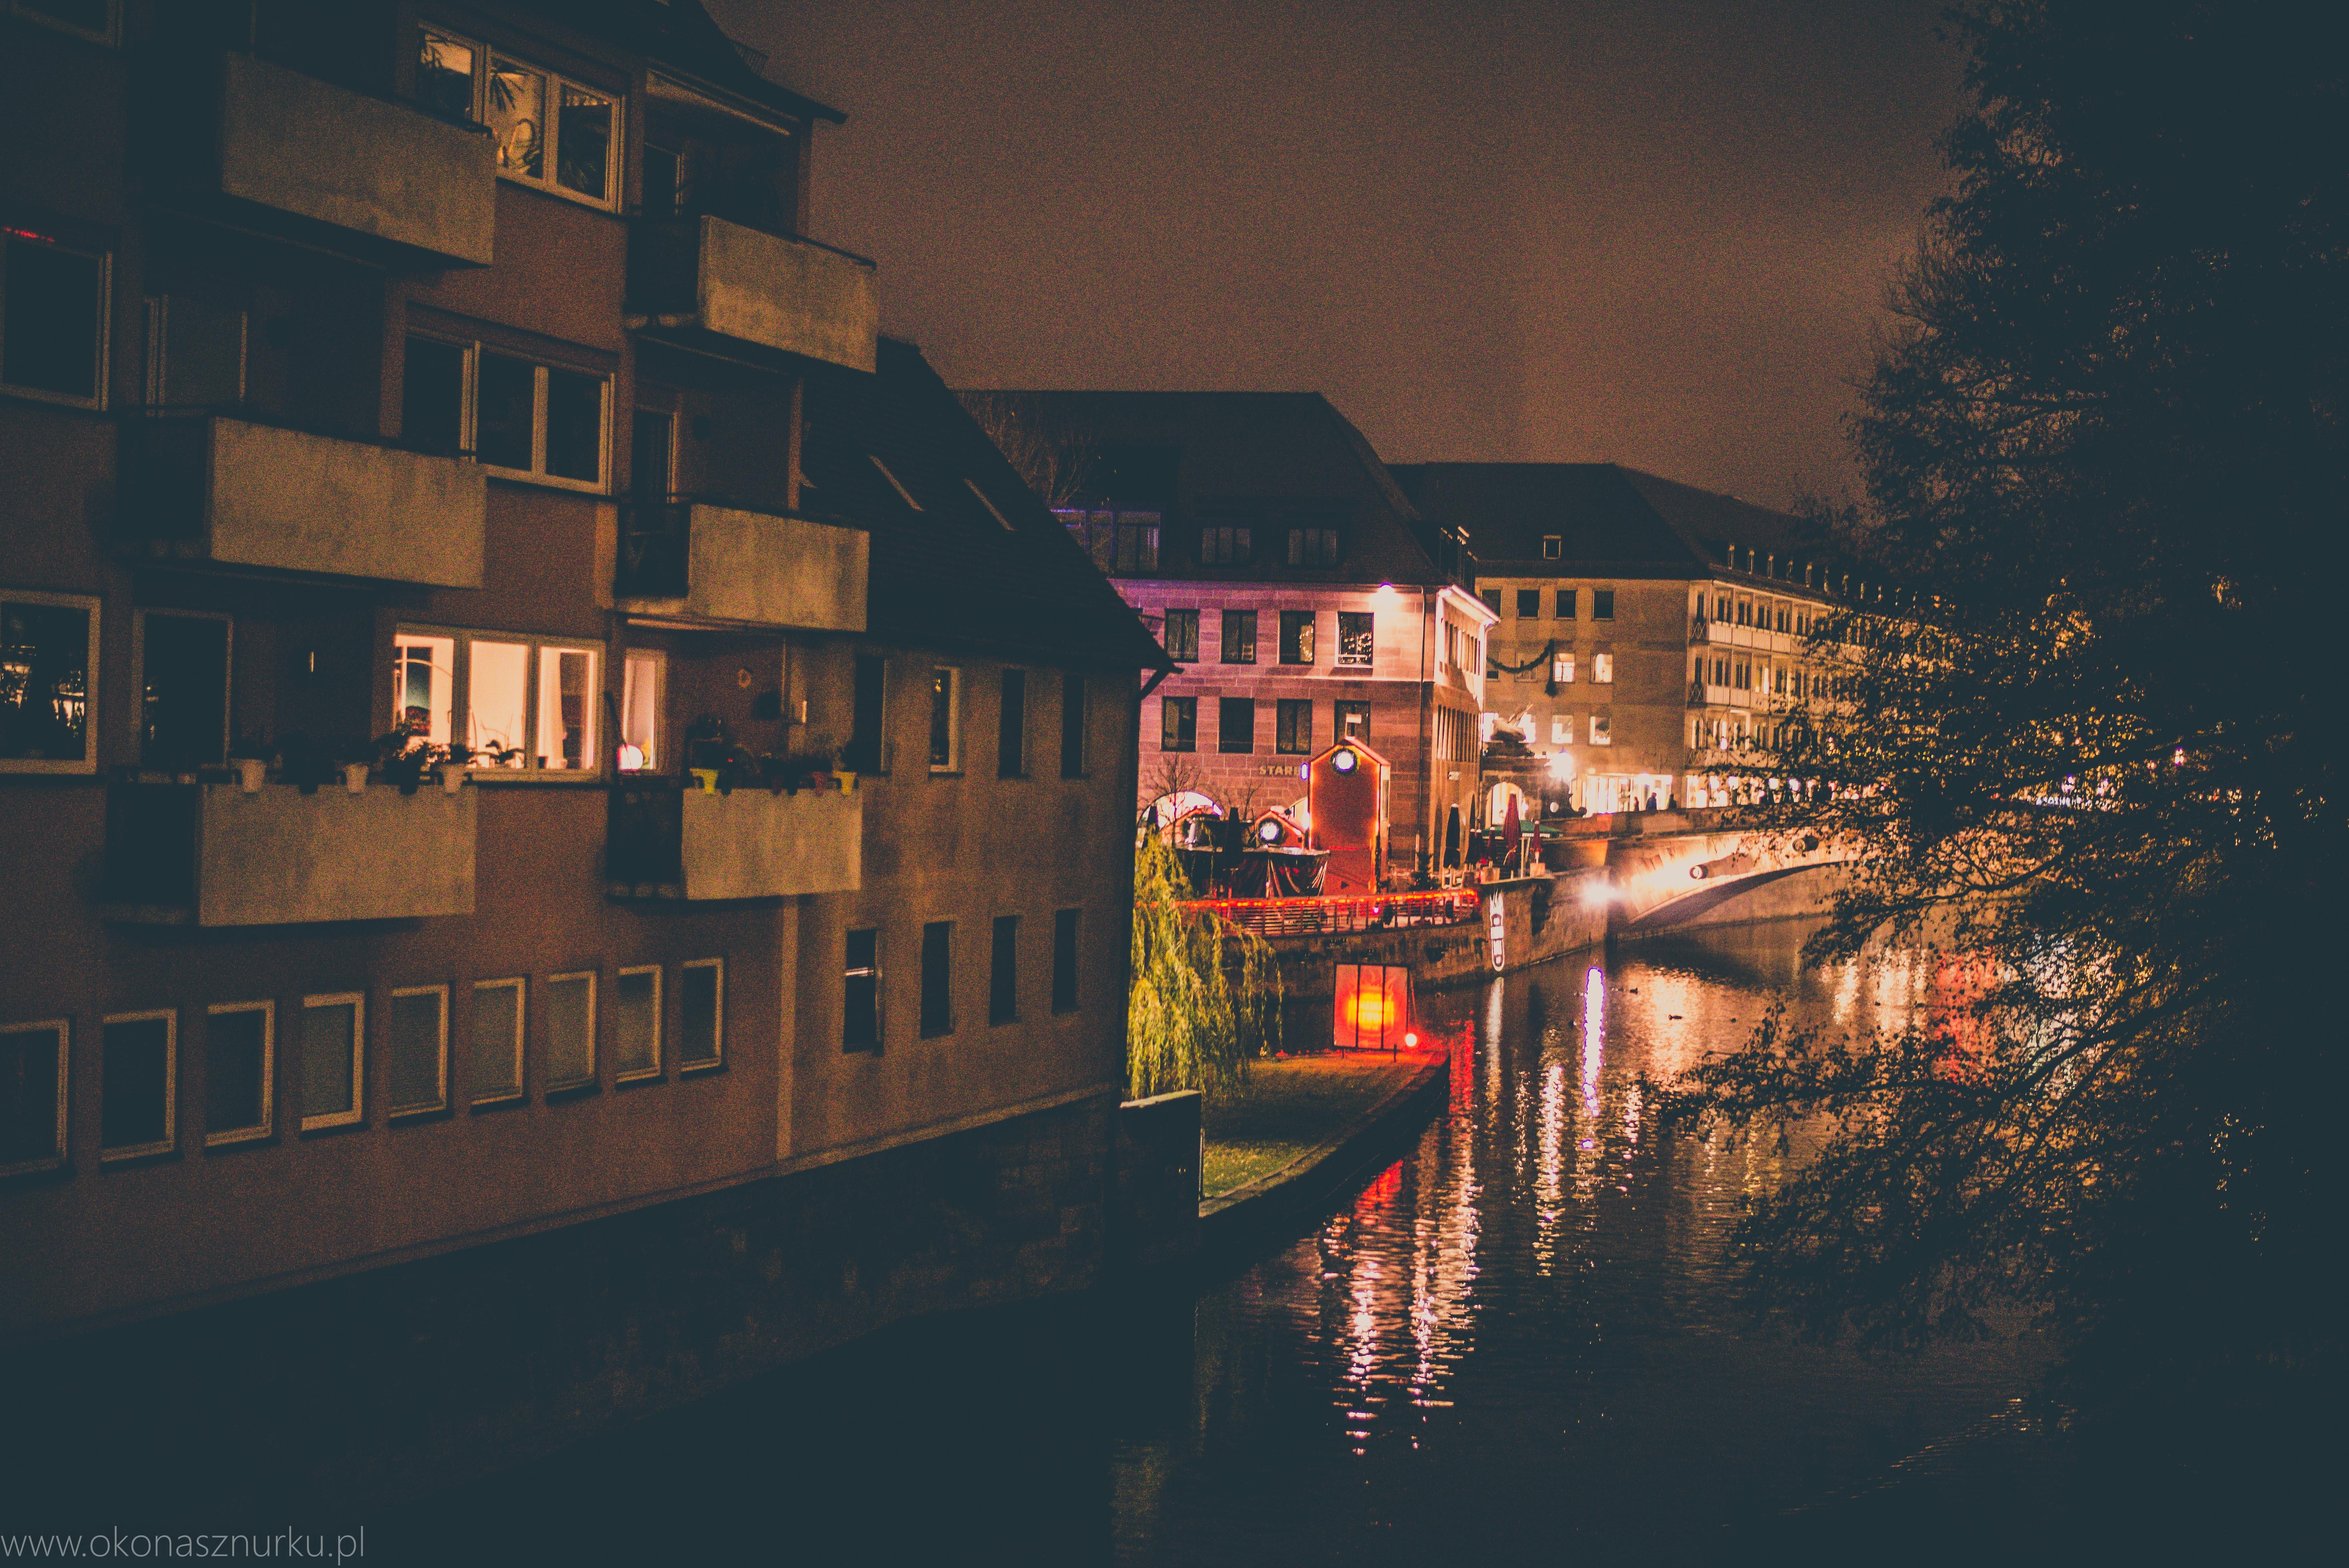 Nürnberg-stadt-norymberga-bayern-city-frankonia (2)